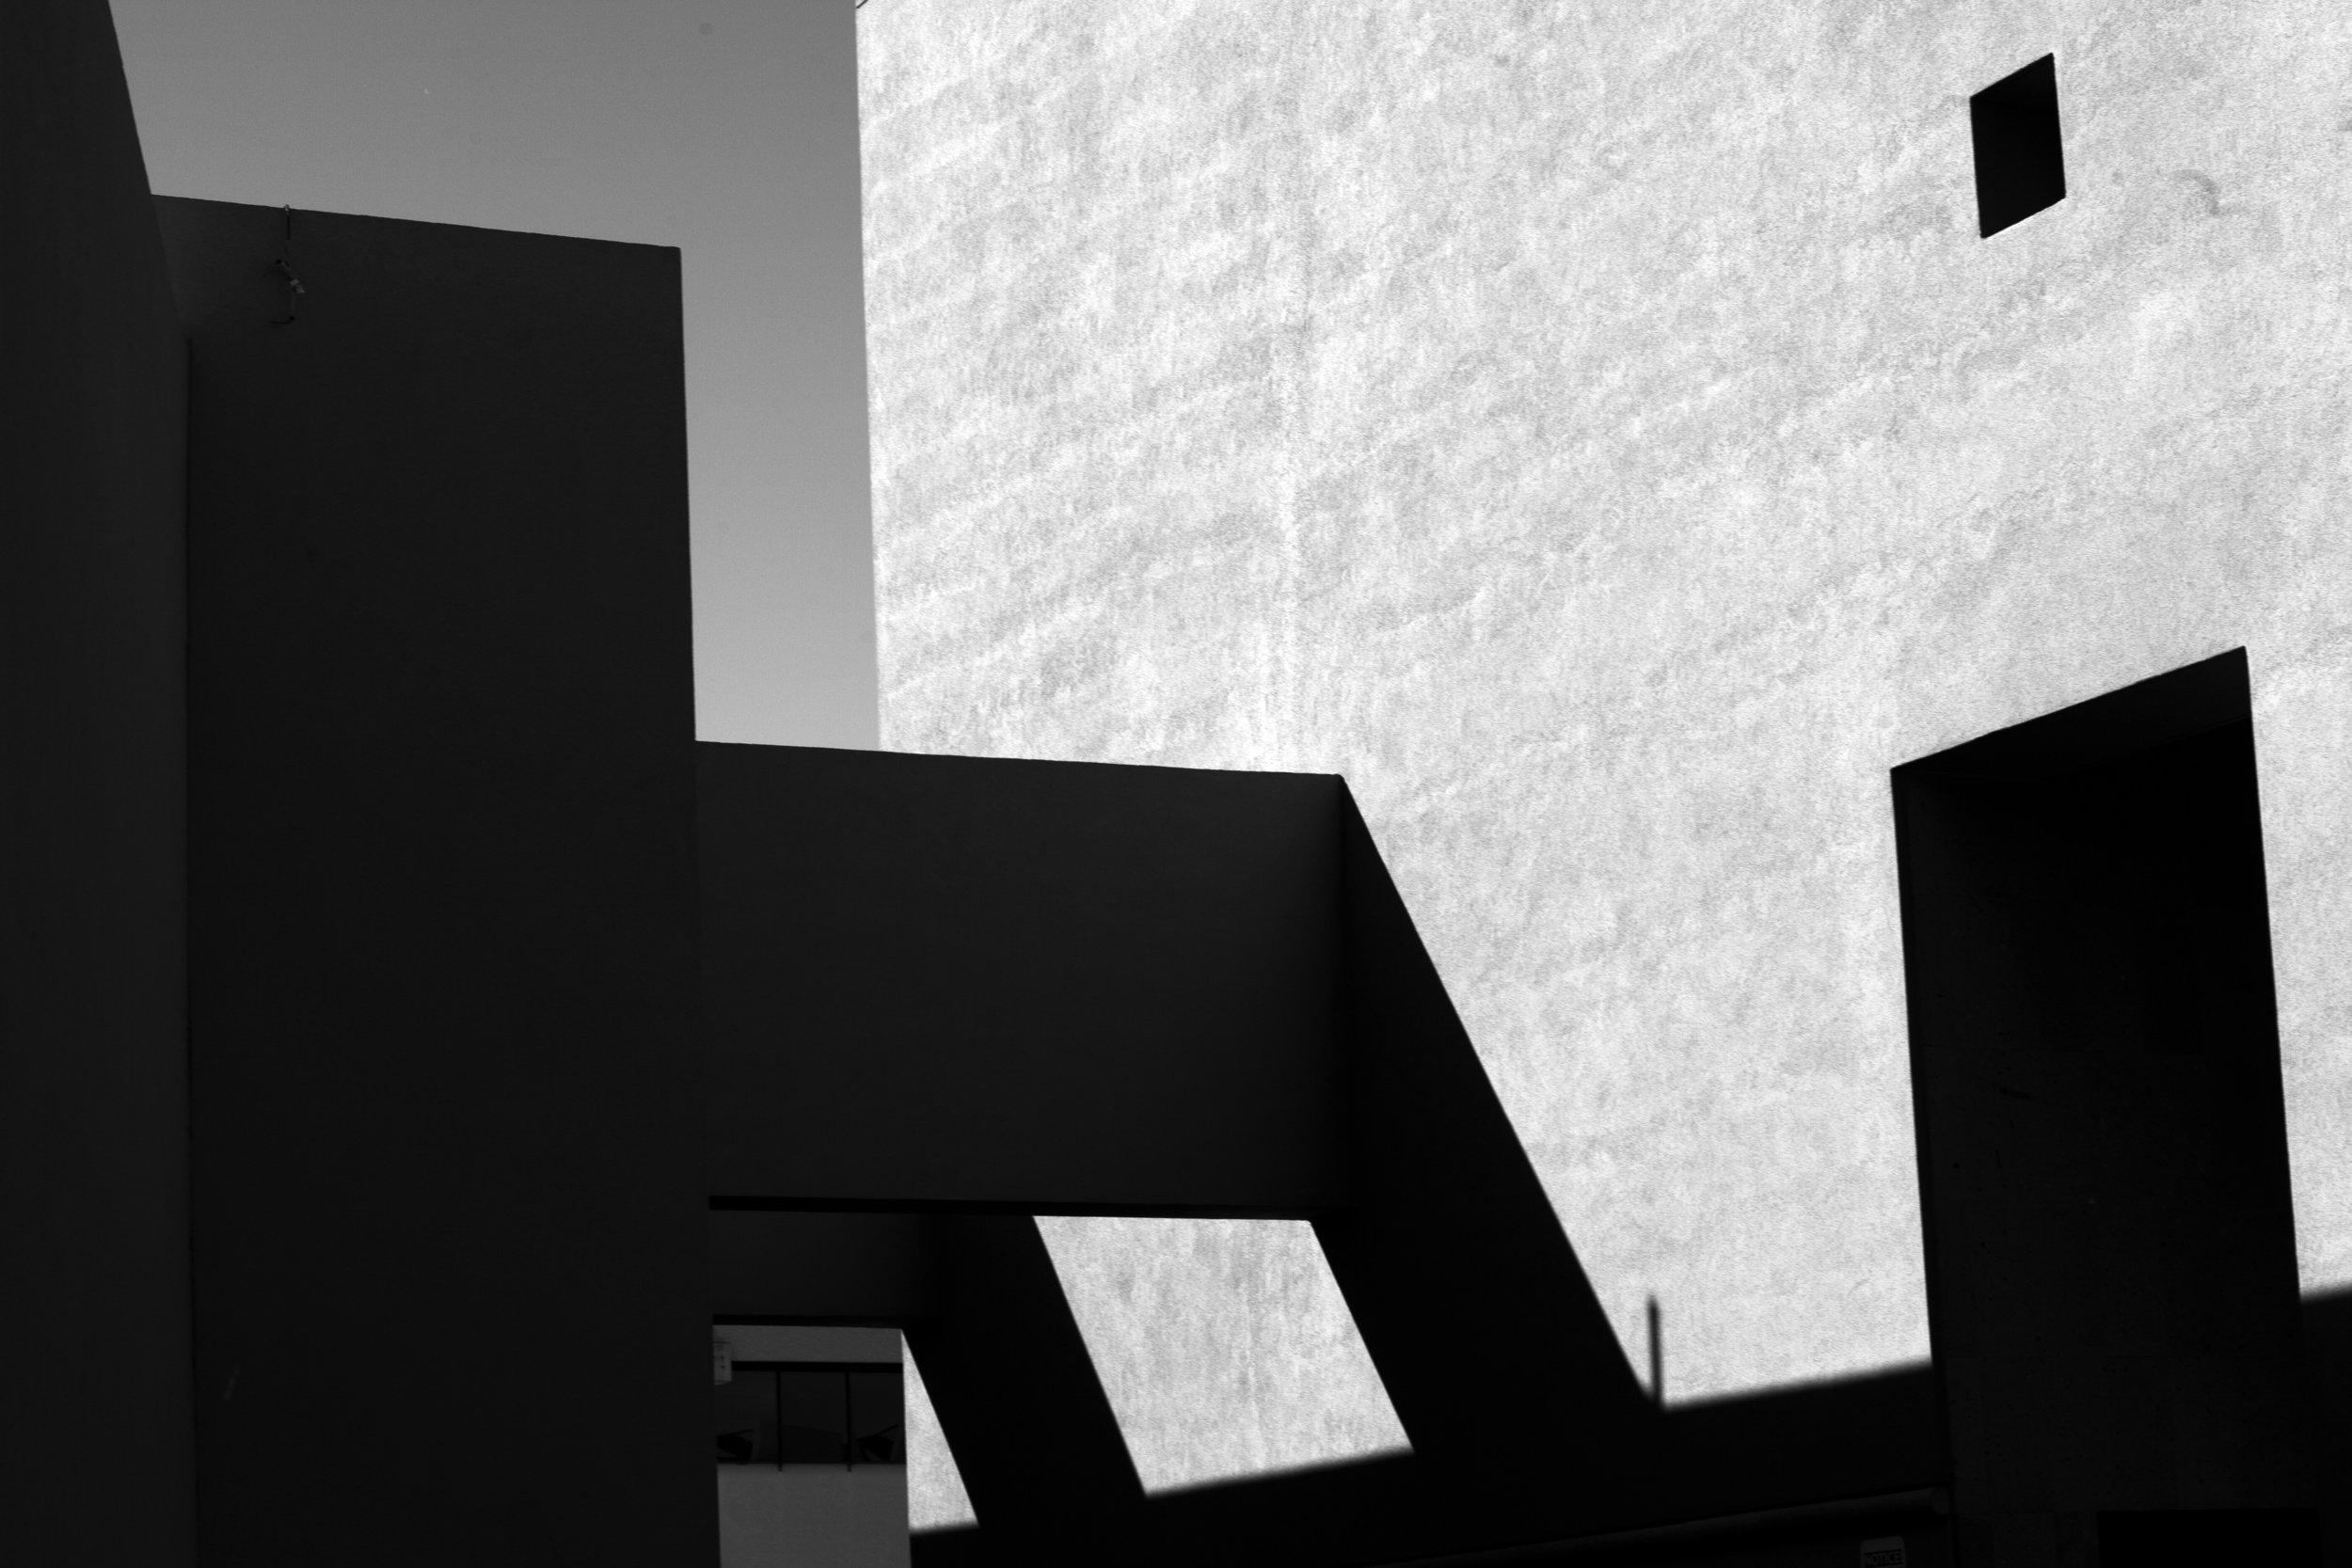 architecture_photography_fabian_villa_3.jpg